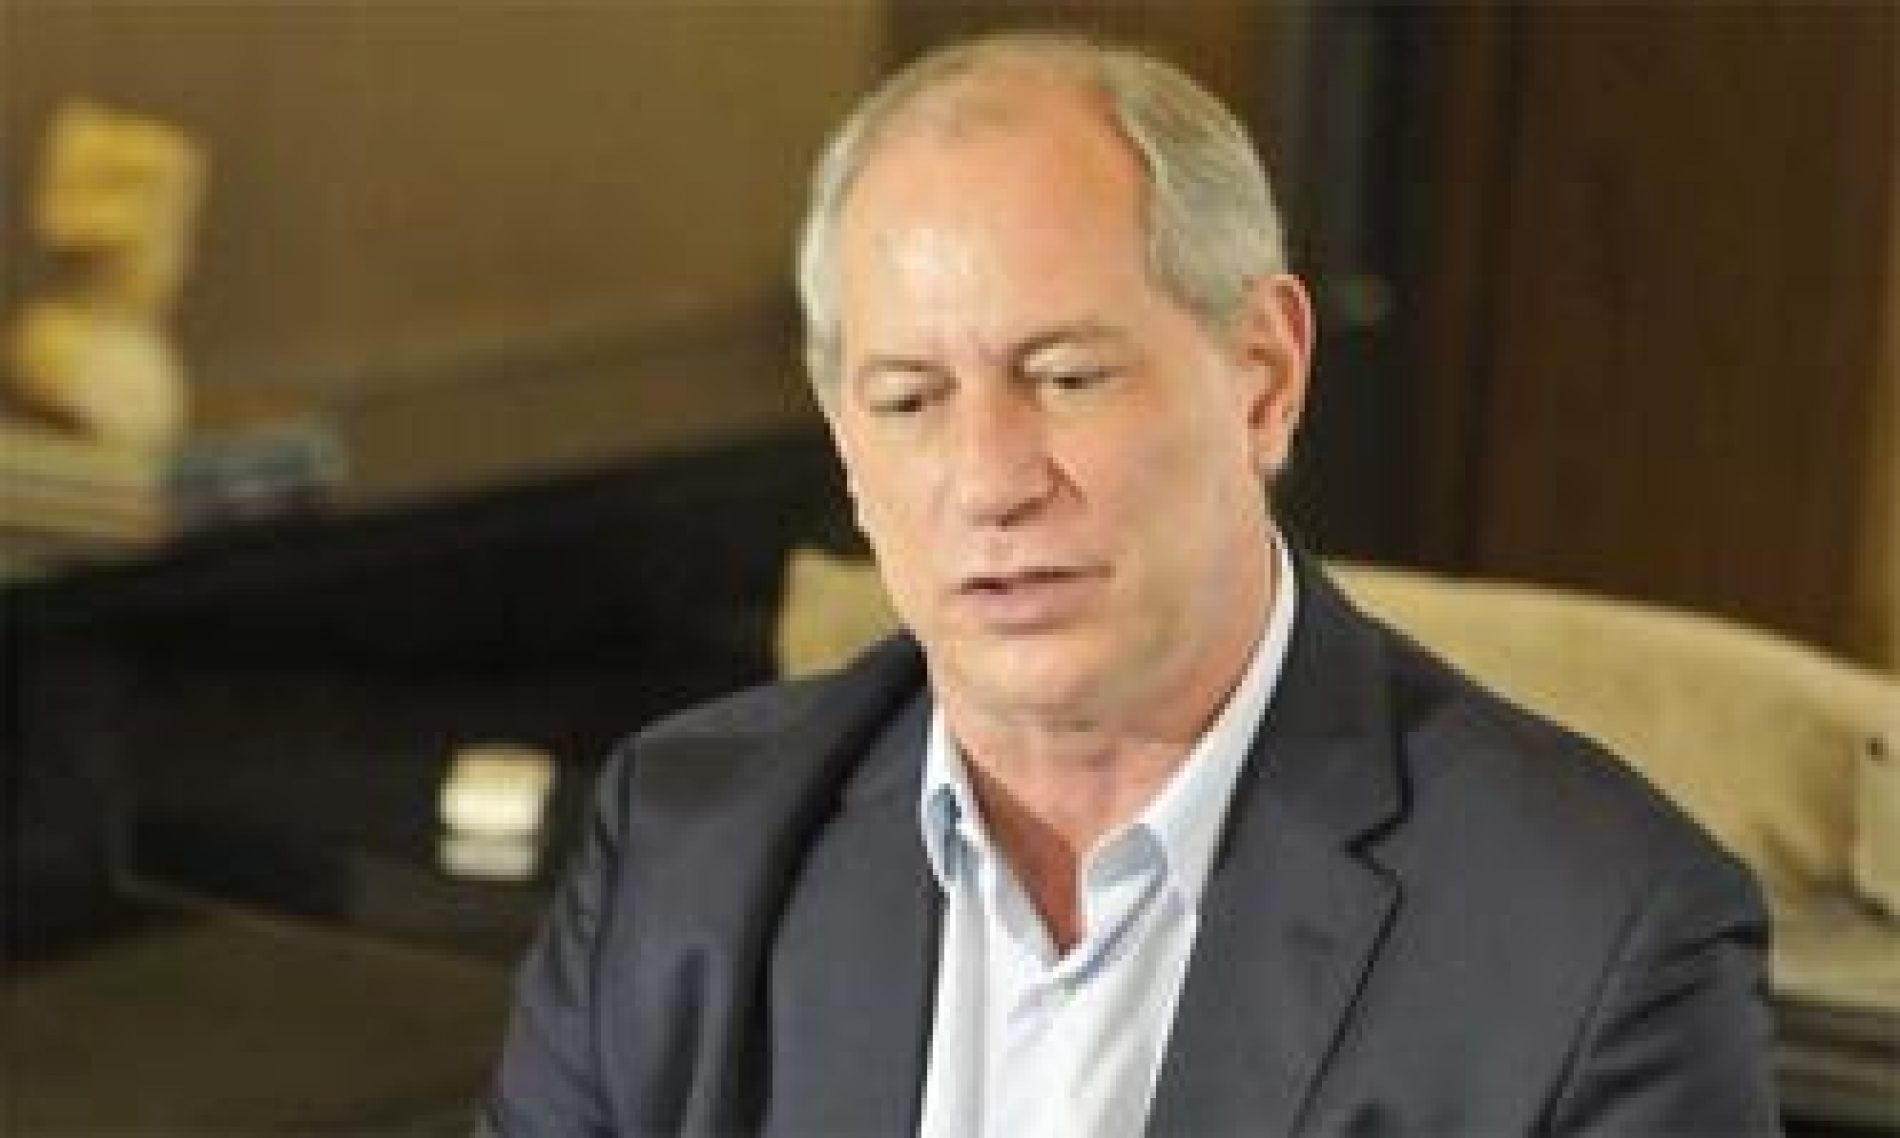 Ciro questiona viabilidade da candidatura de Fernando Haddad